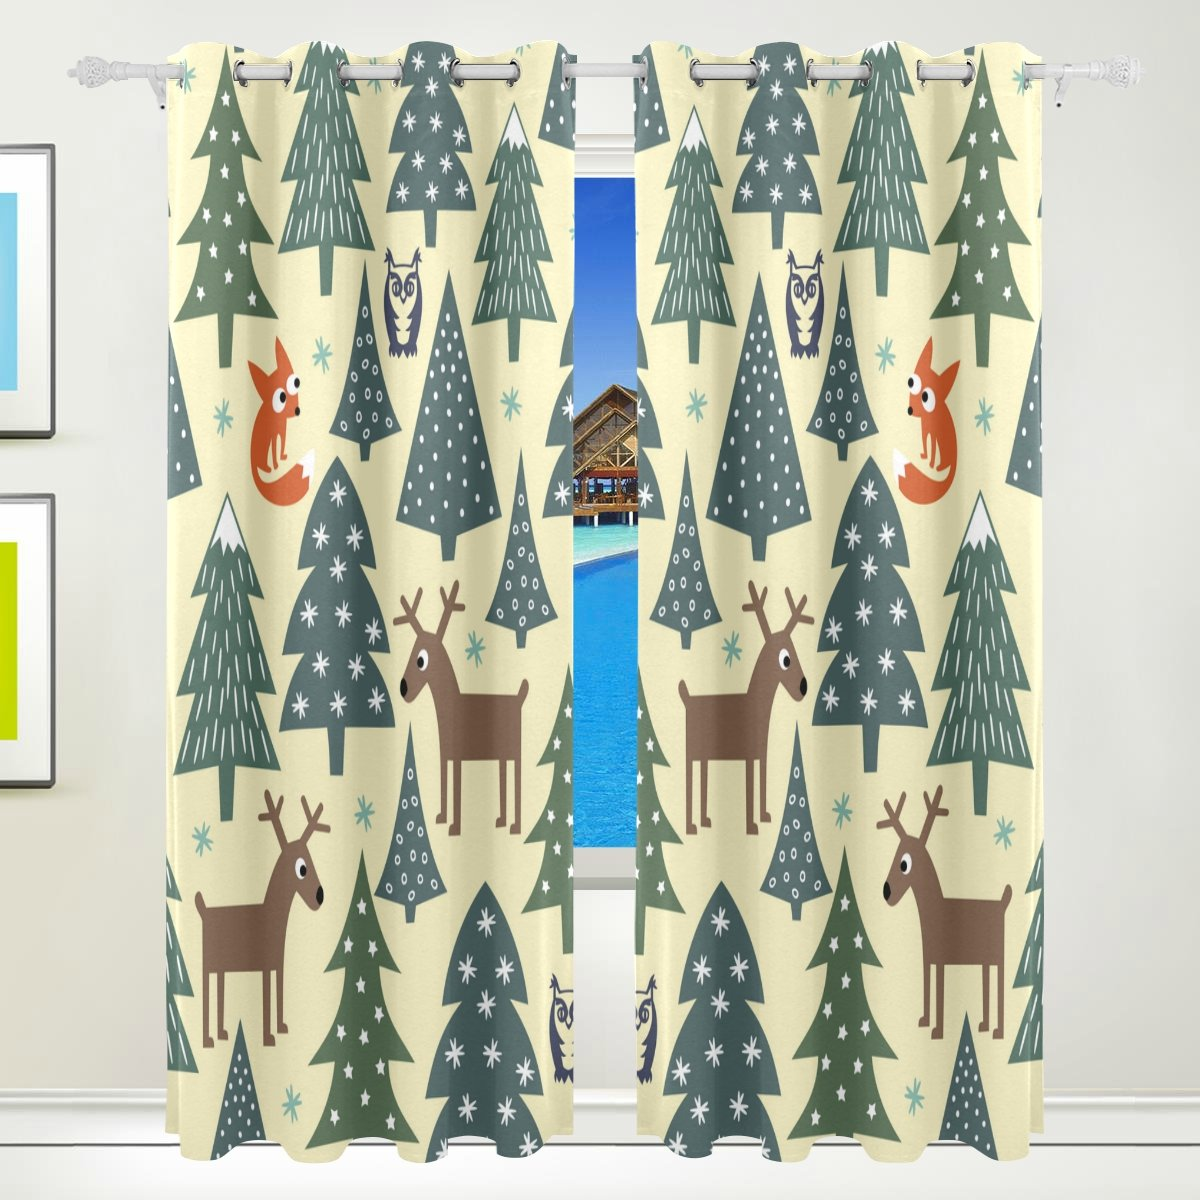 Vantaso Window Curtains 84 Inch Long Forest Animal Deer Owl Fox for Kids Girls Boys Bedroom Living Room Polyester 2 Pannels